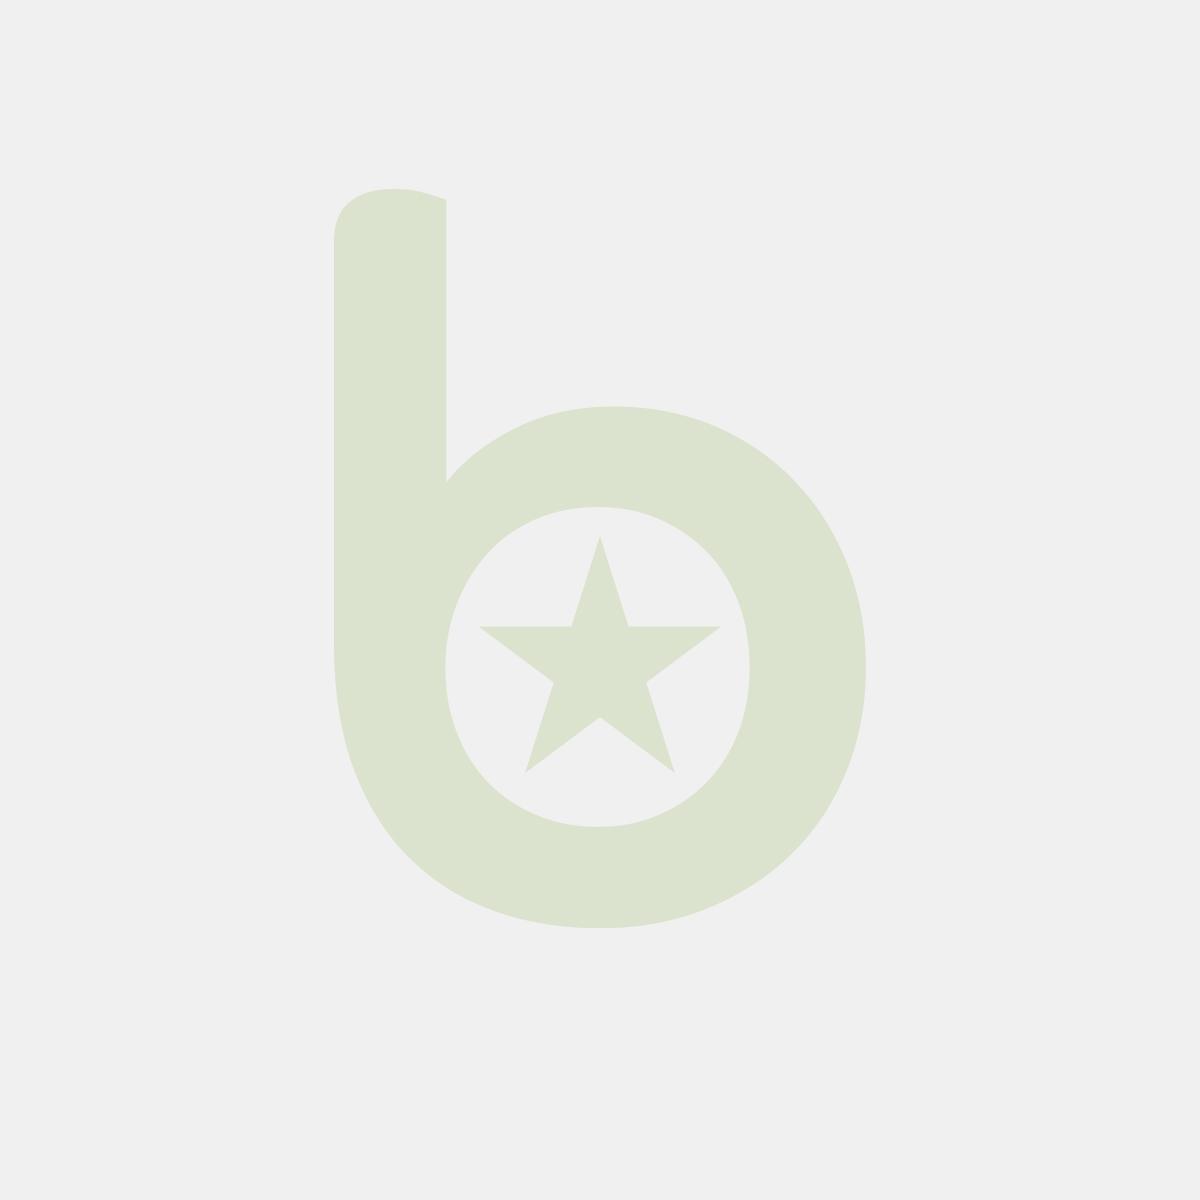 Cienkopis SCHNEIDER Line-Up, 0,4mm, zielony